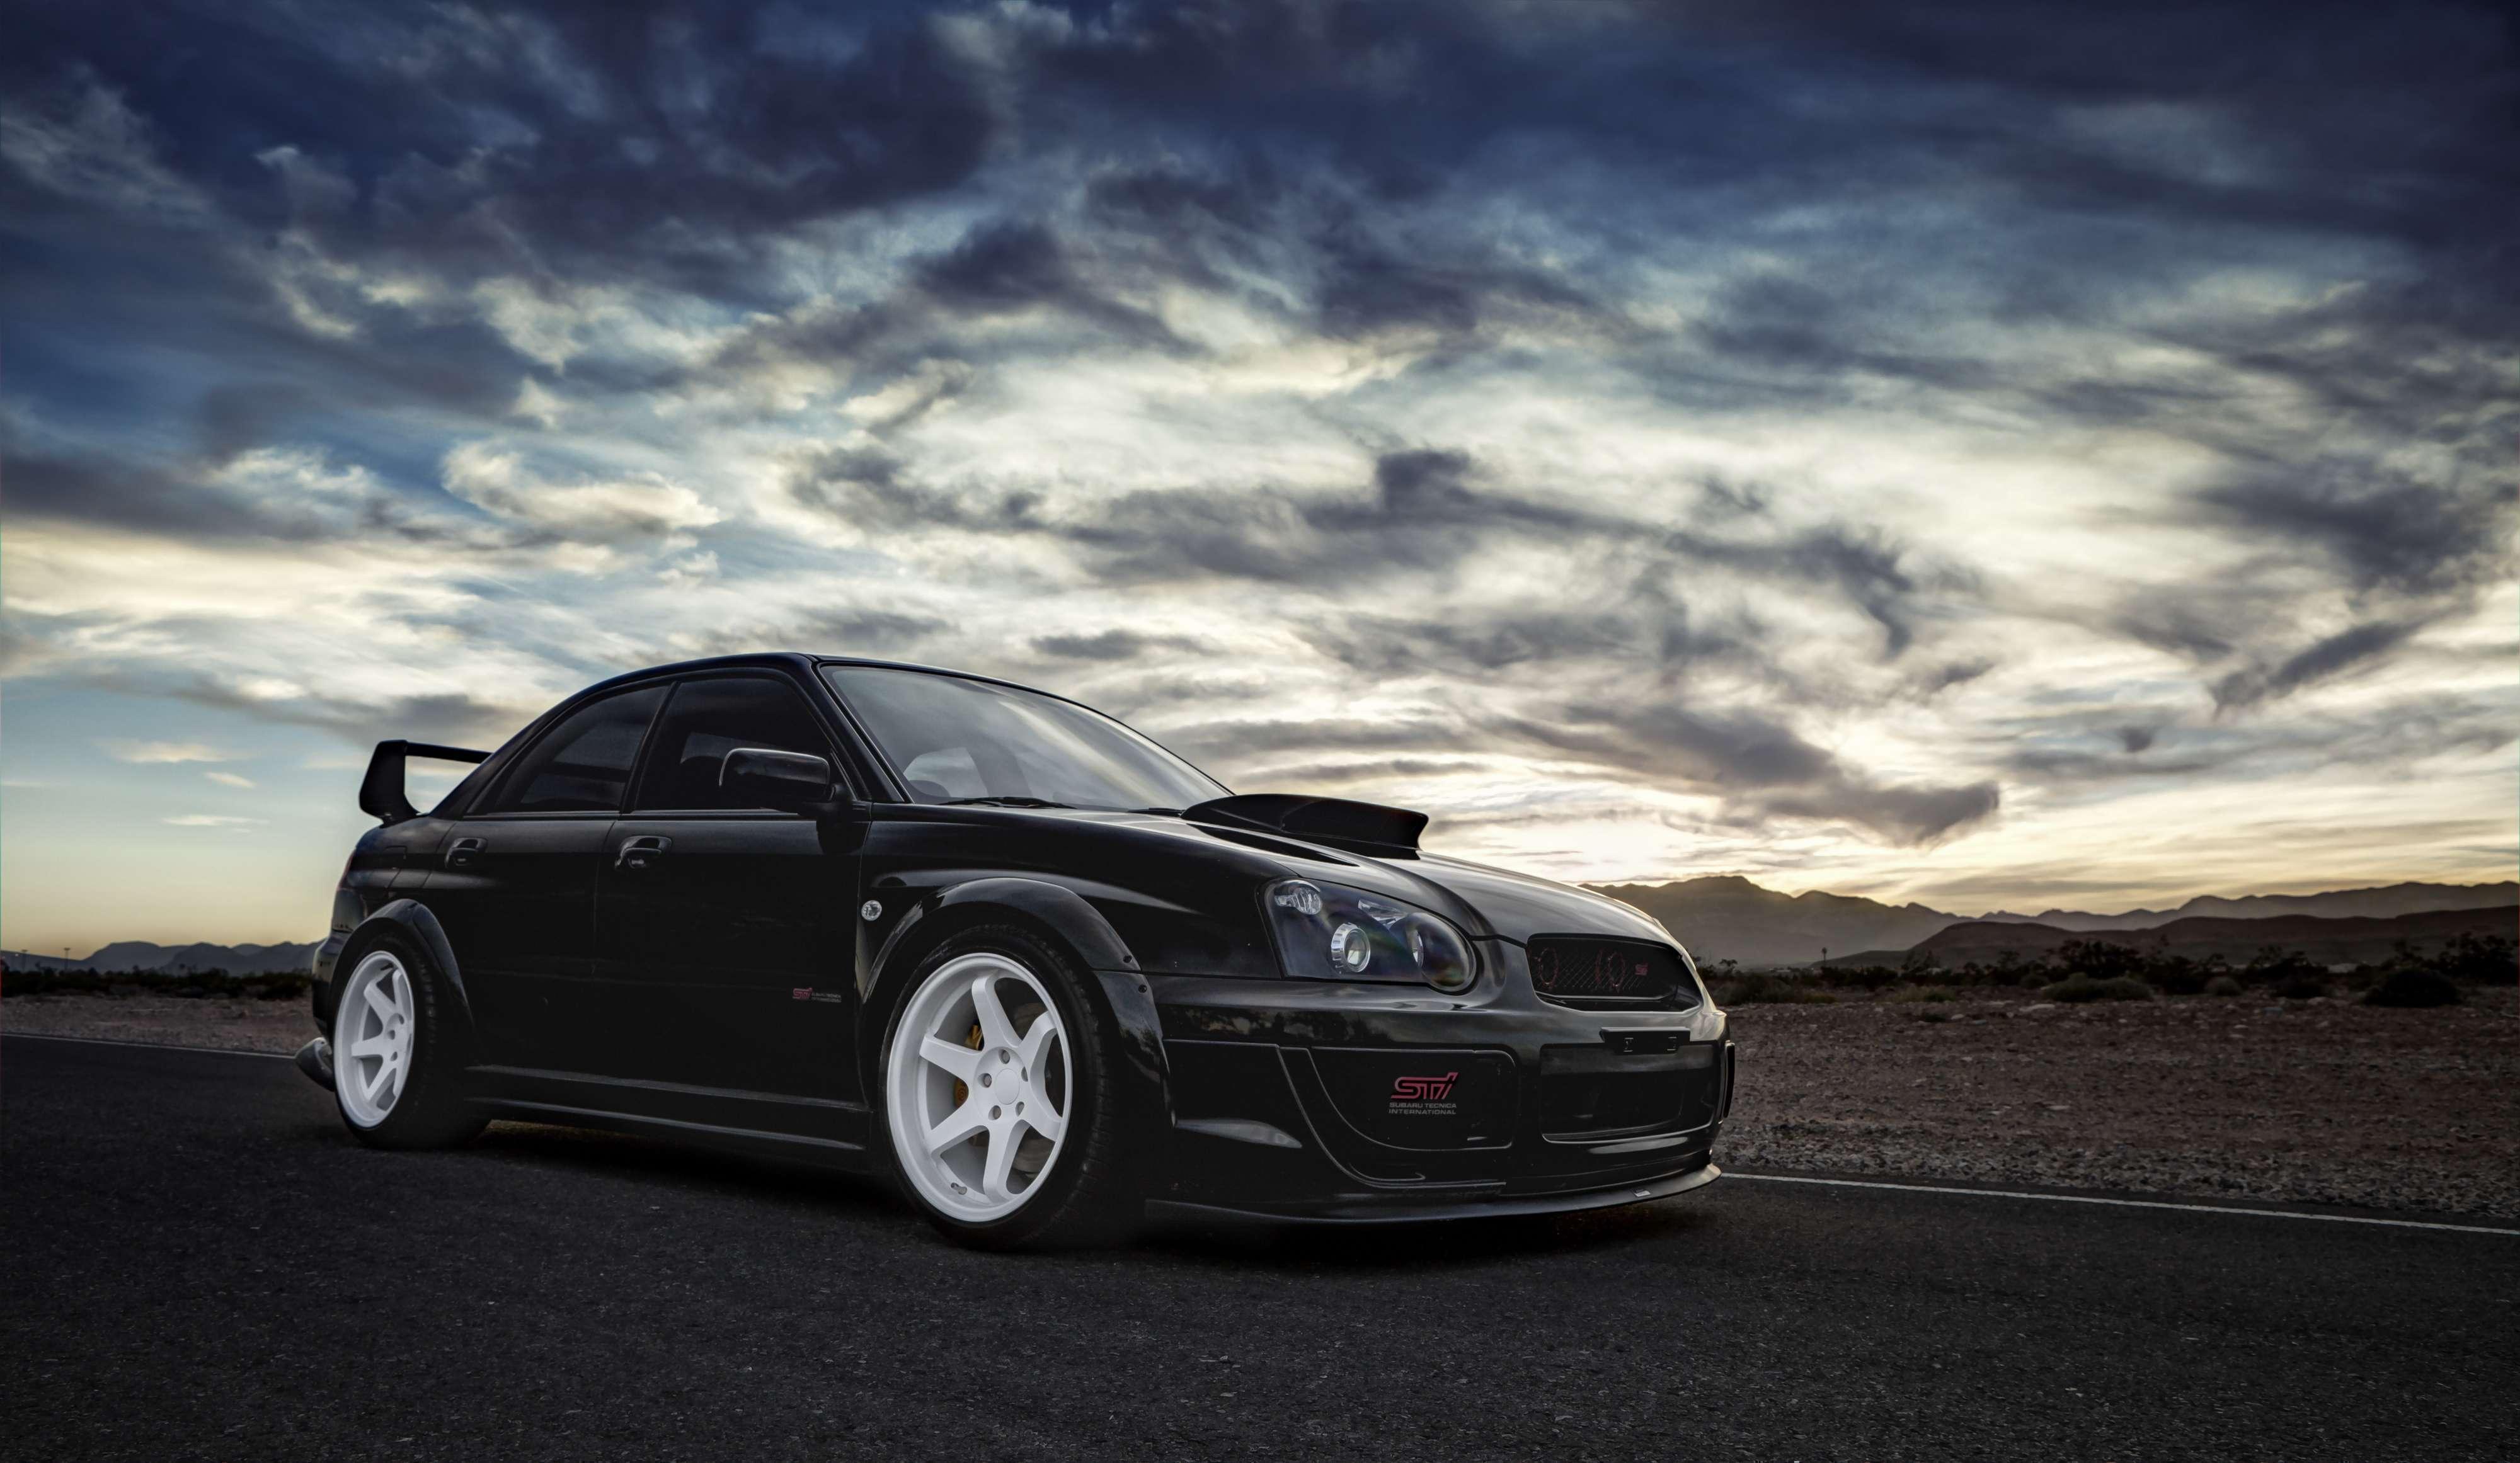 Wonderful View Of Subaru Impreza Wrx Sti Wallpapers Hd Car Wallpapers 4000x2323